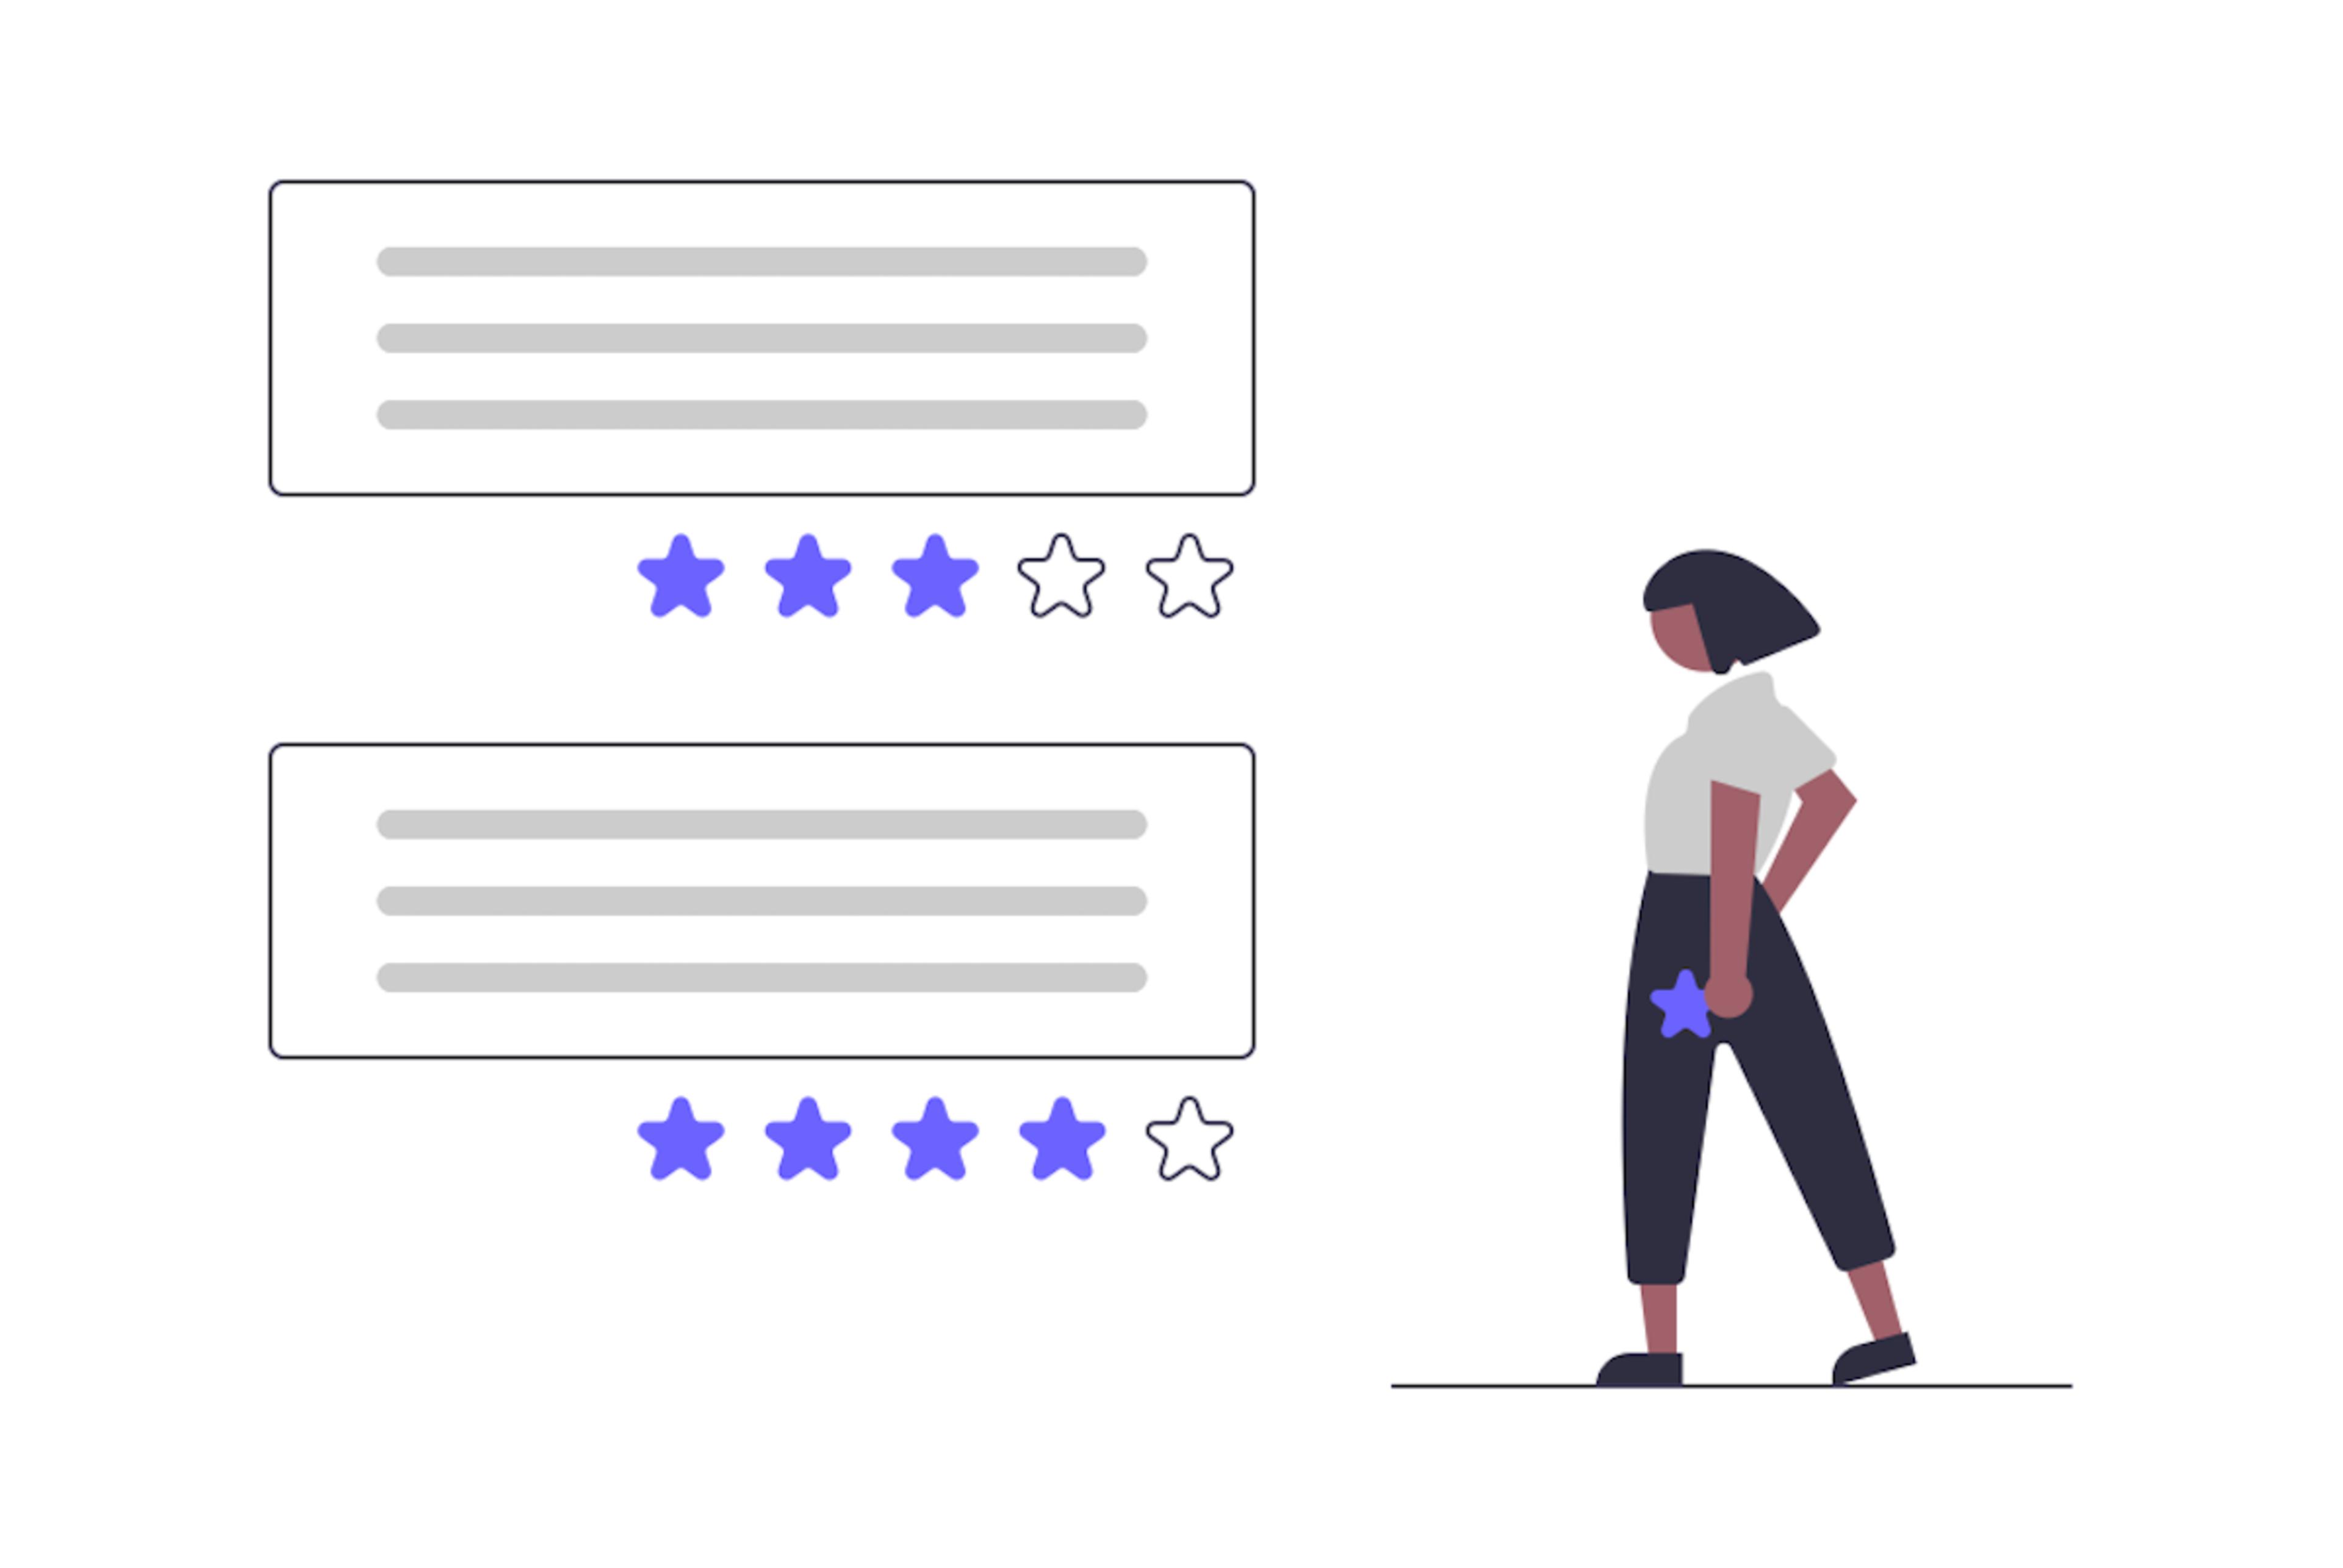 Performance reviews should have peer to peer reviews